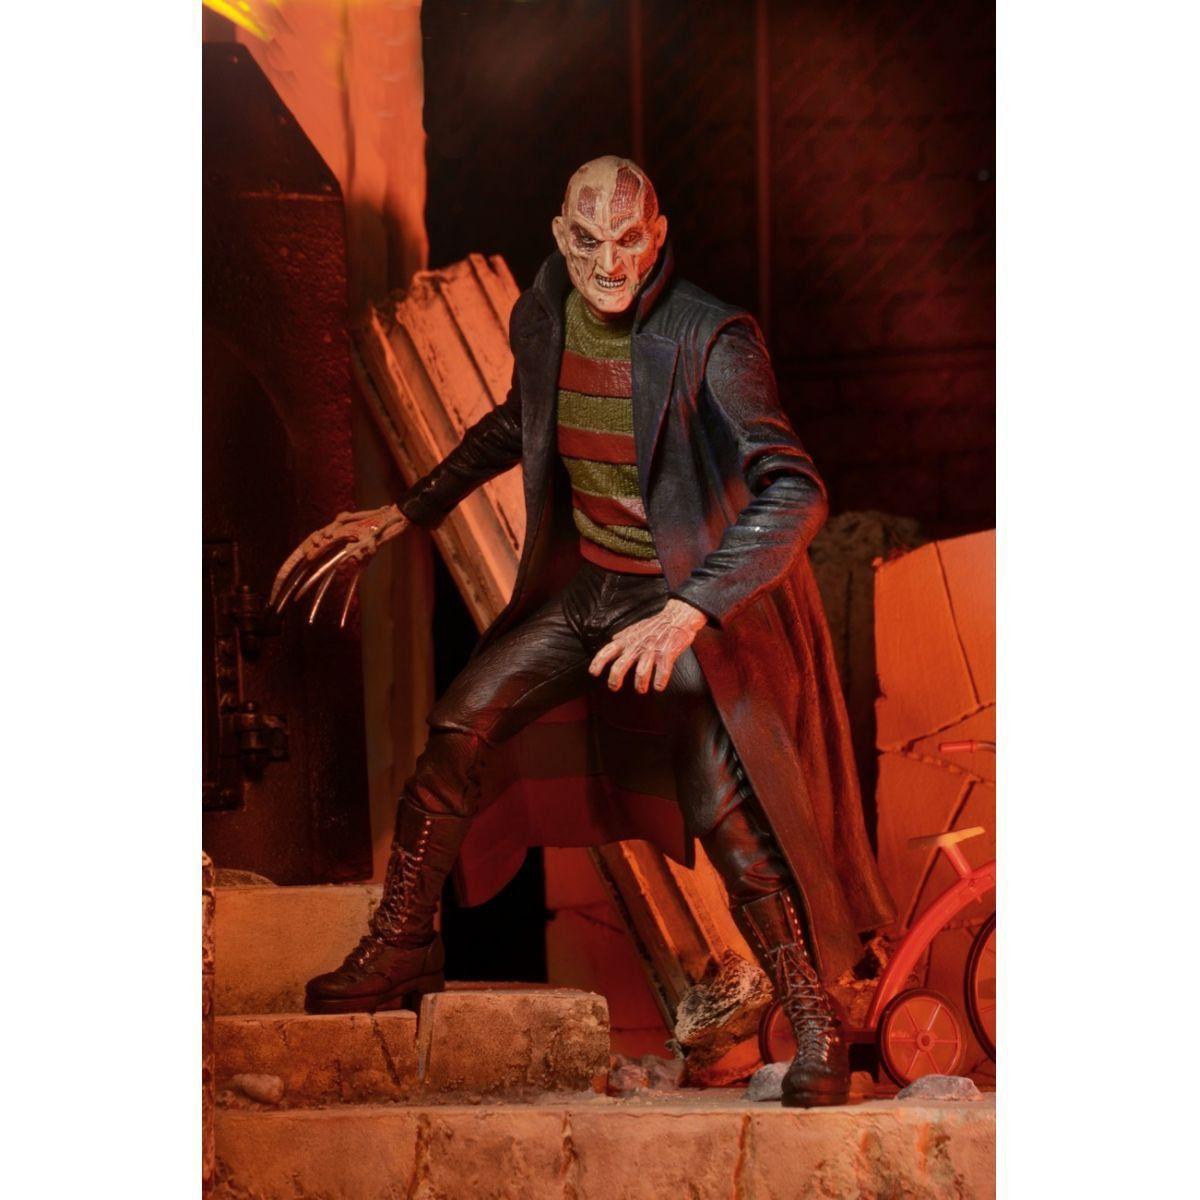 New Nightmare Freddy Krueger Escala 1/10 - Neca